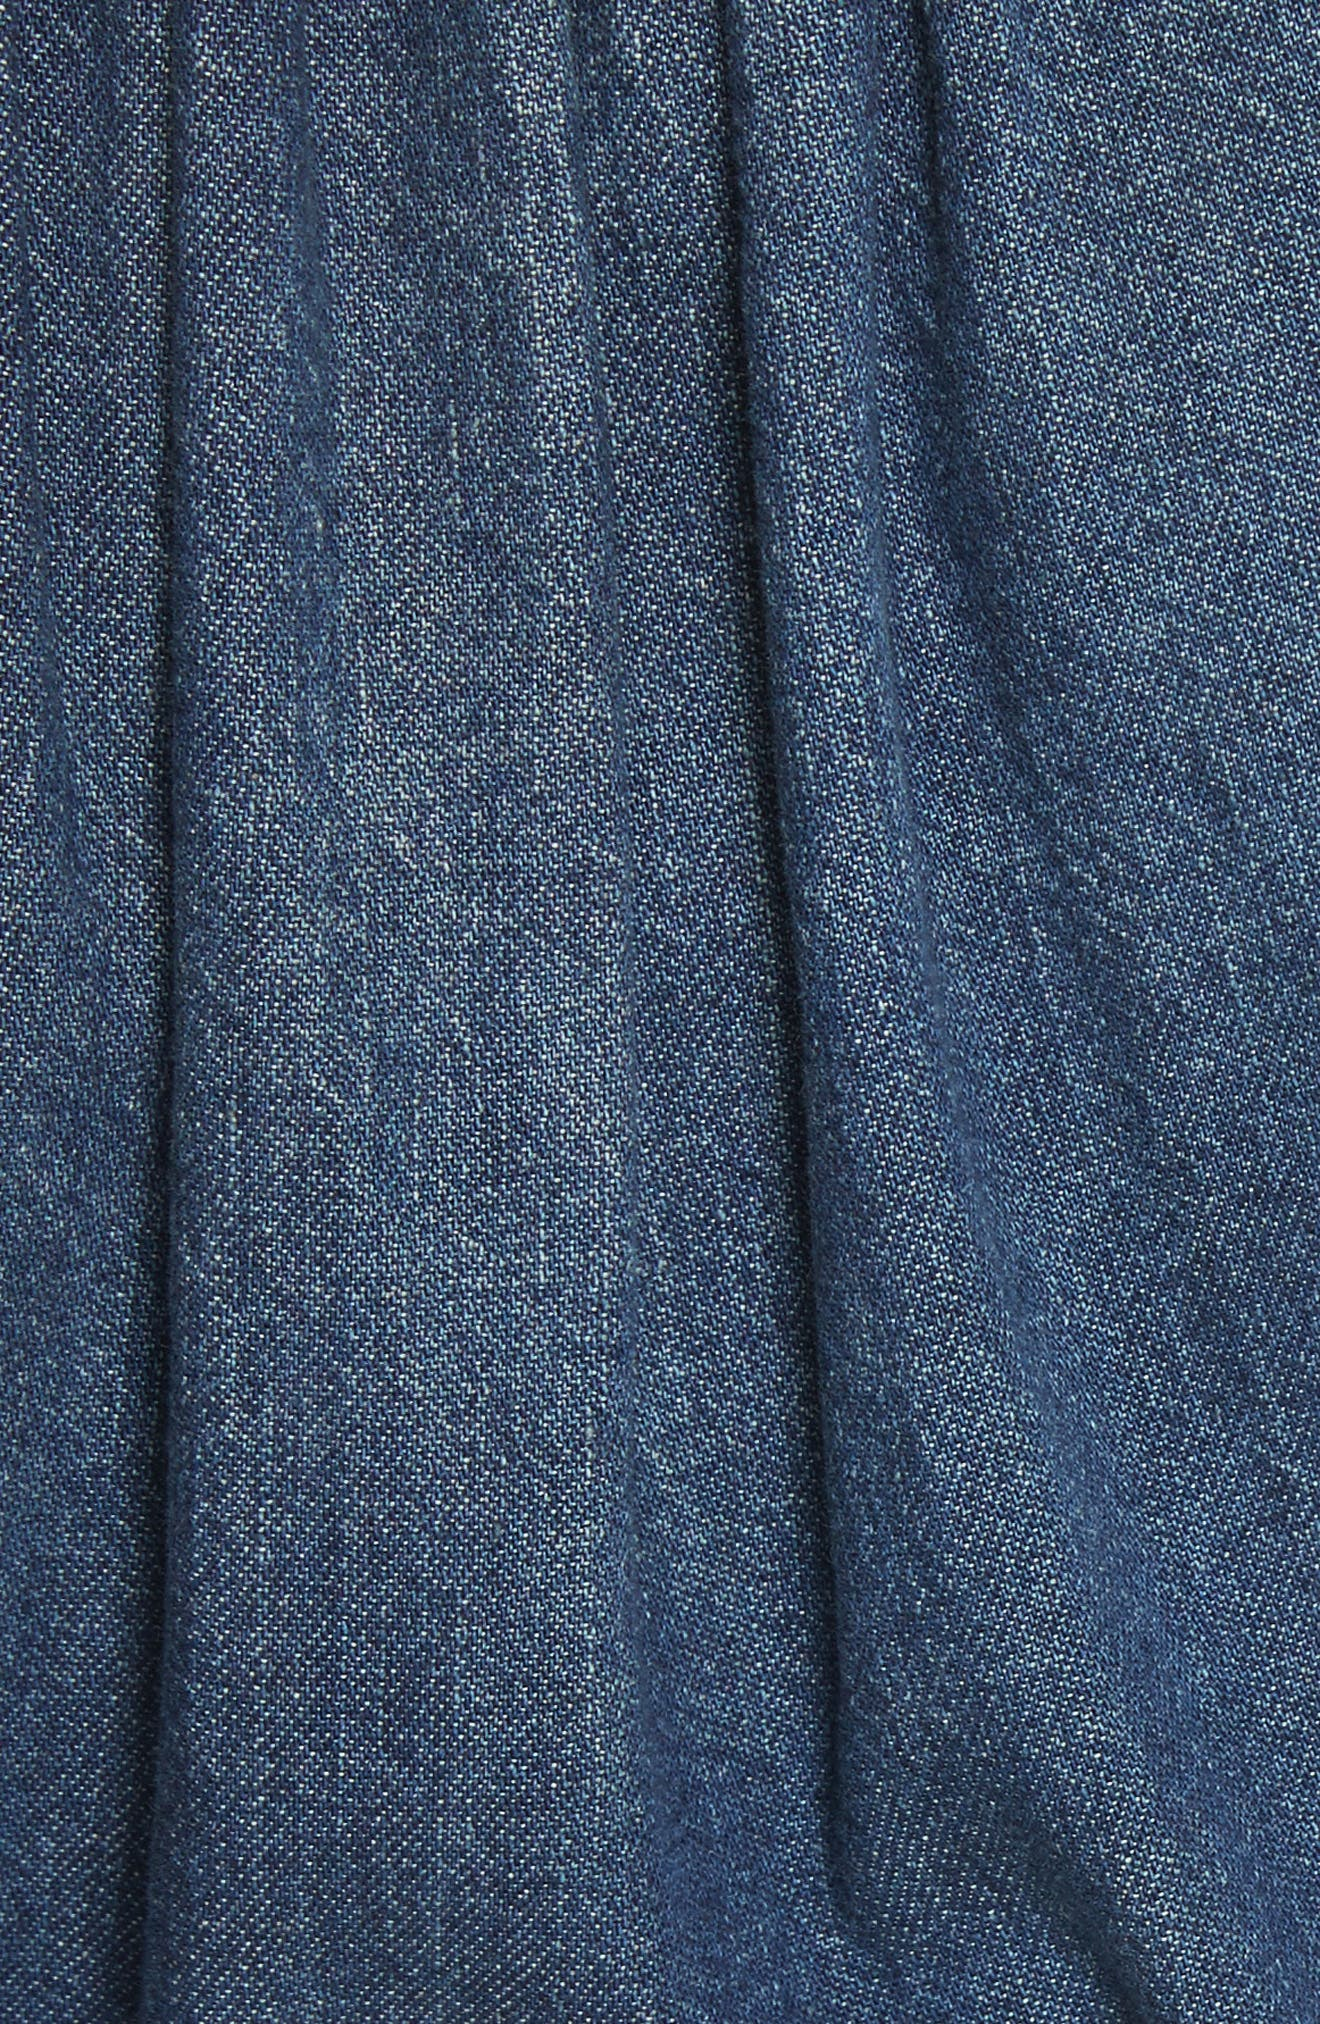 Denim Wrap Dress,                             Alternate thumbnail 5, color,                             469